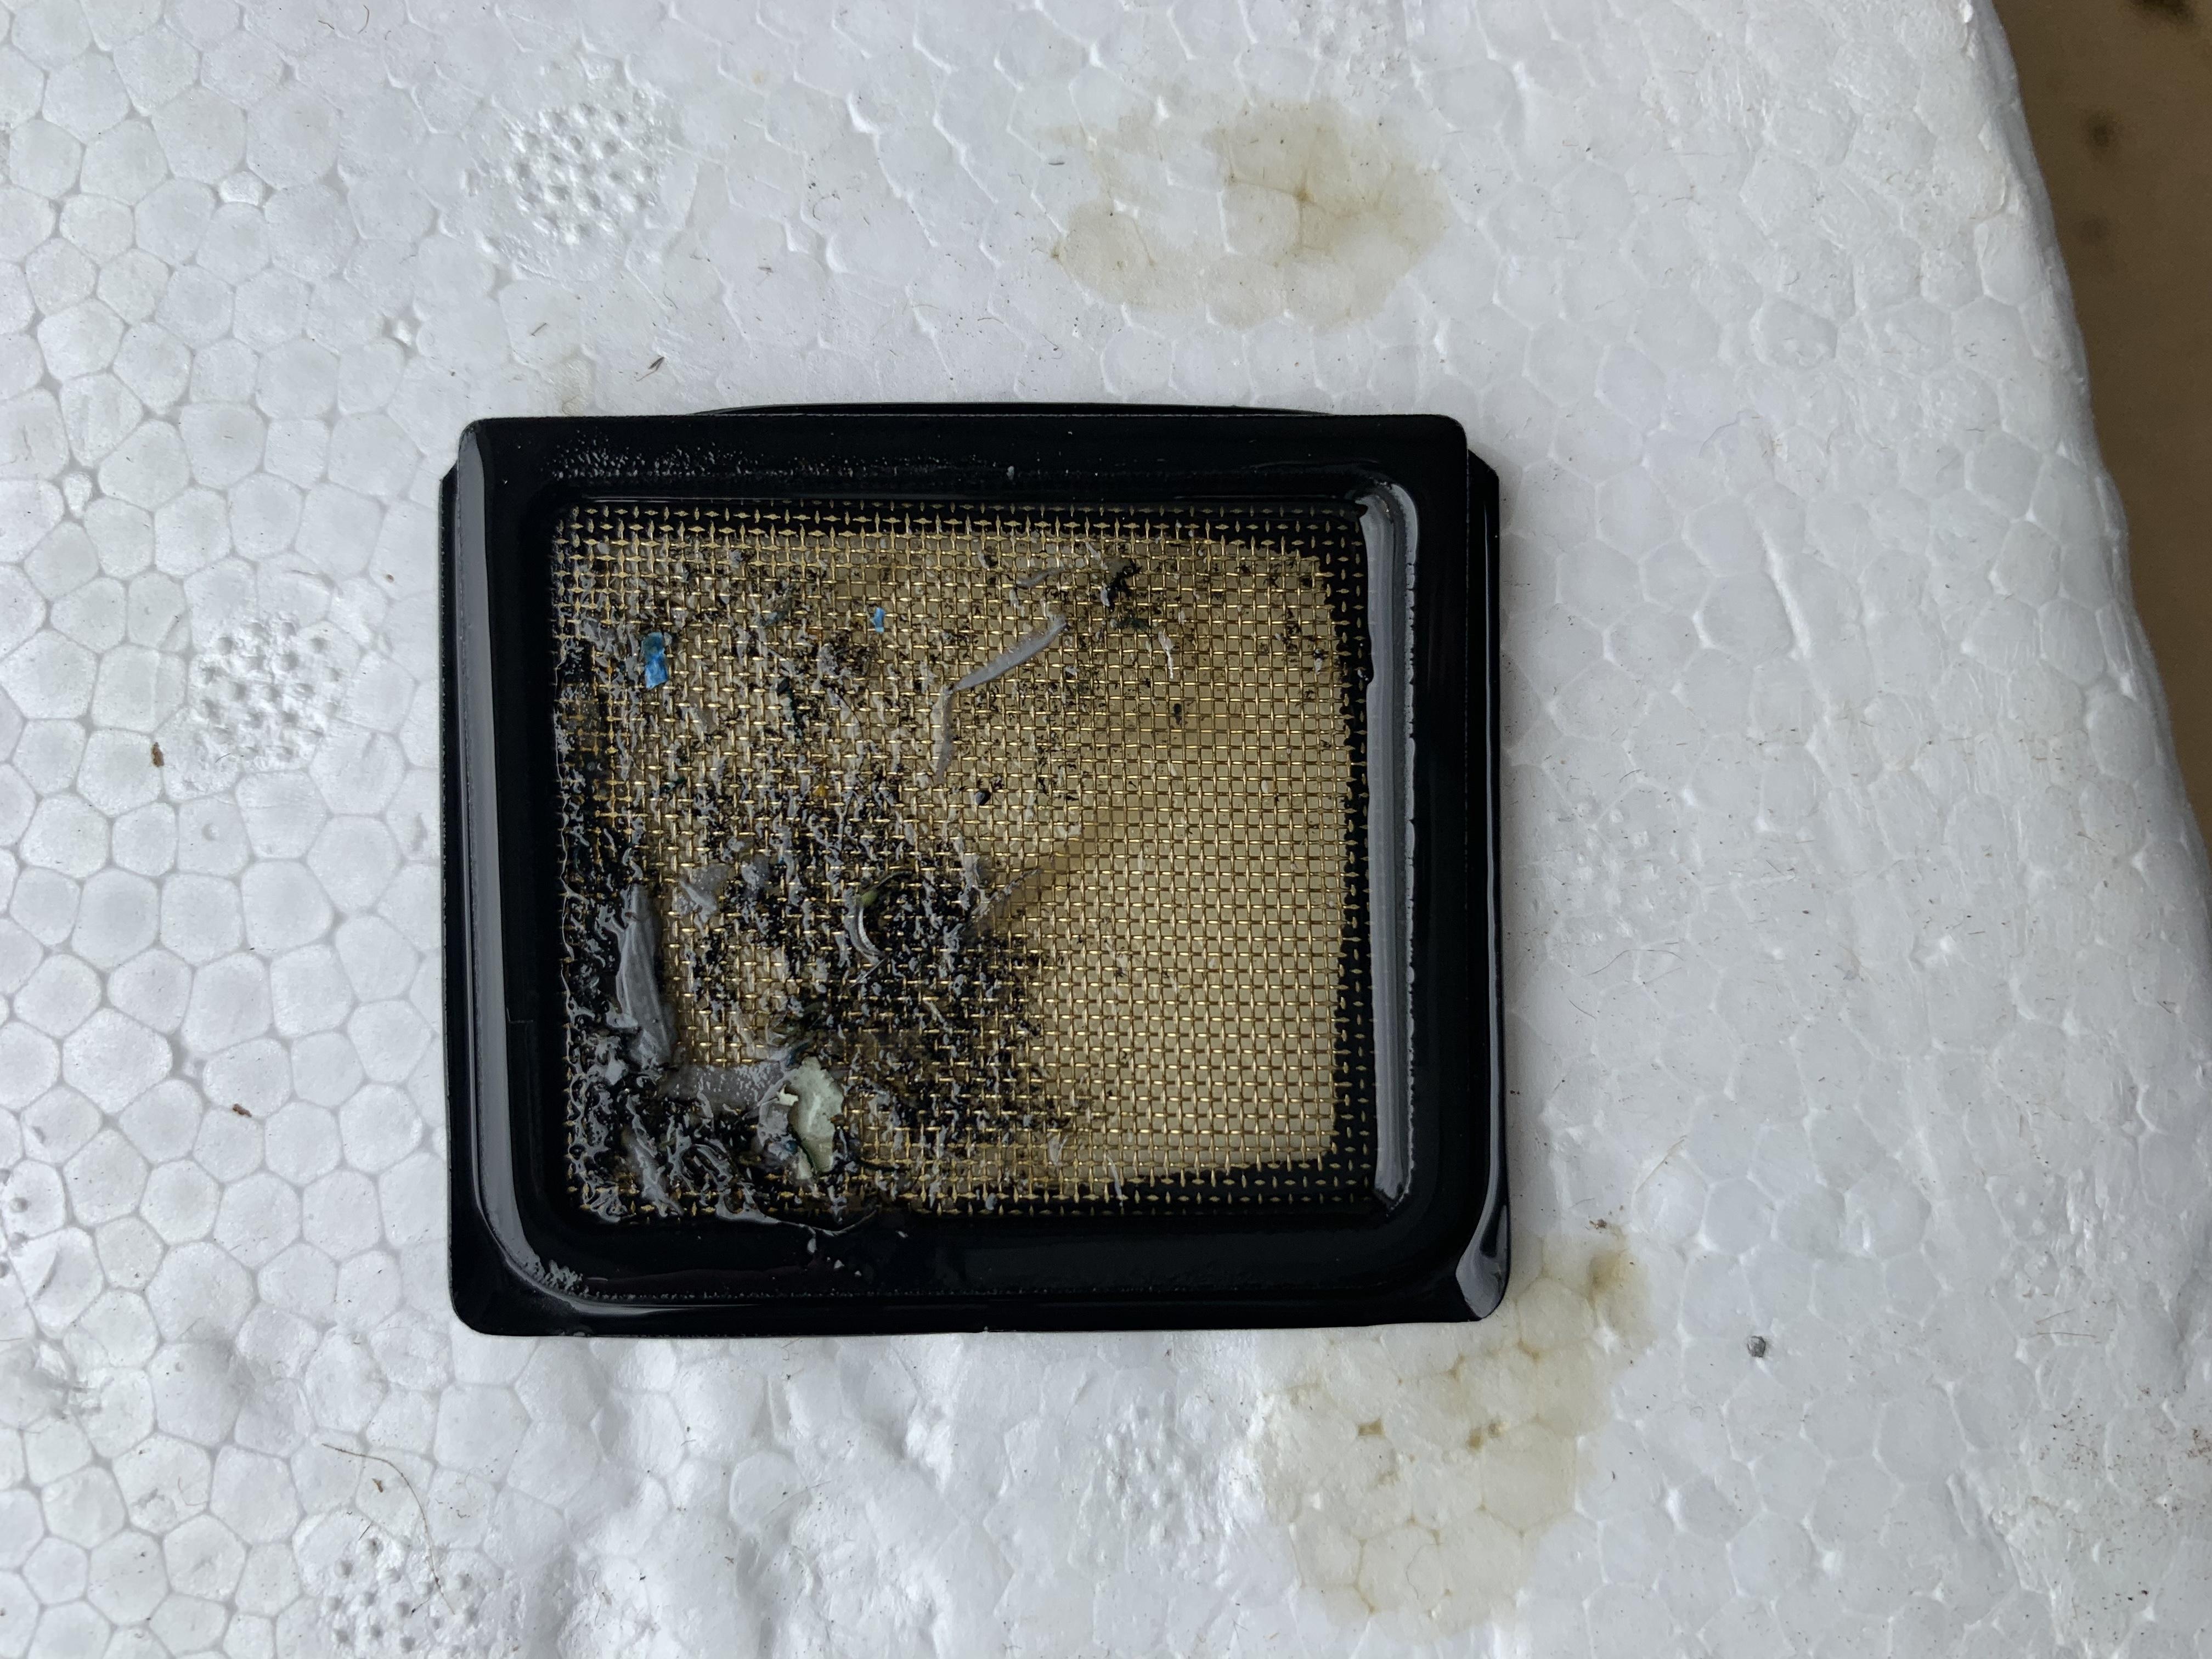 My Oil Screen Is Nasty-7eec5c11-feac-4dbd-932c-1433871421af_1559090339810.jpeg